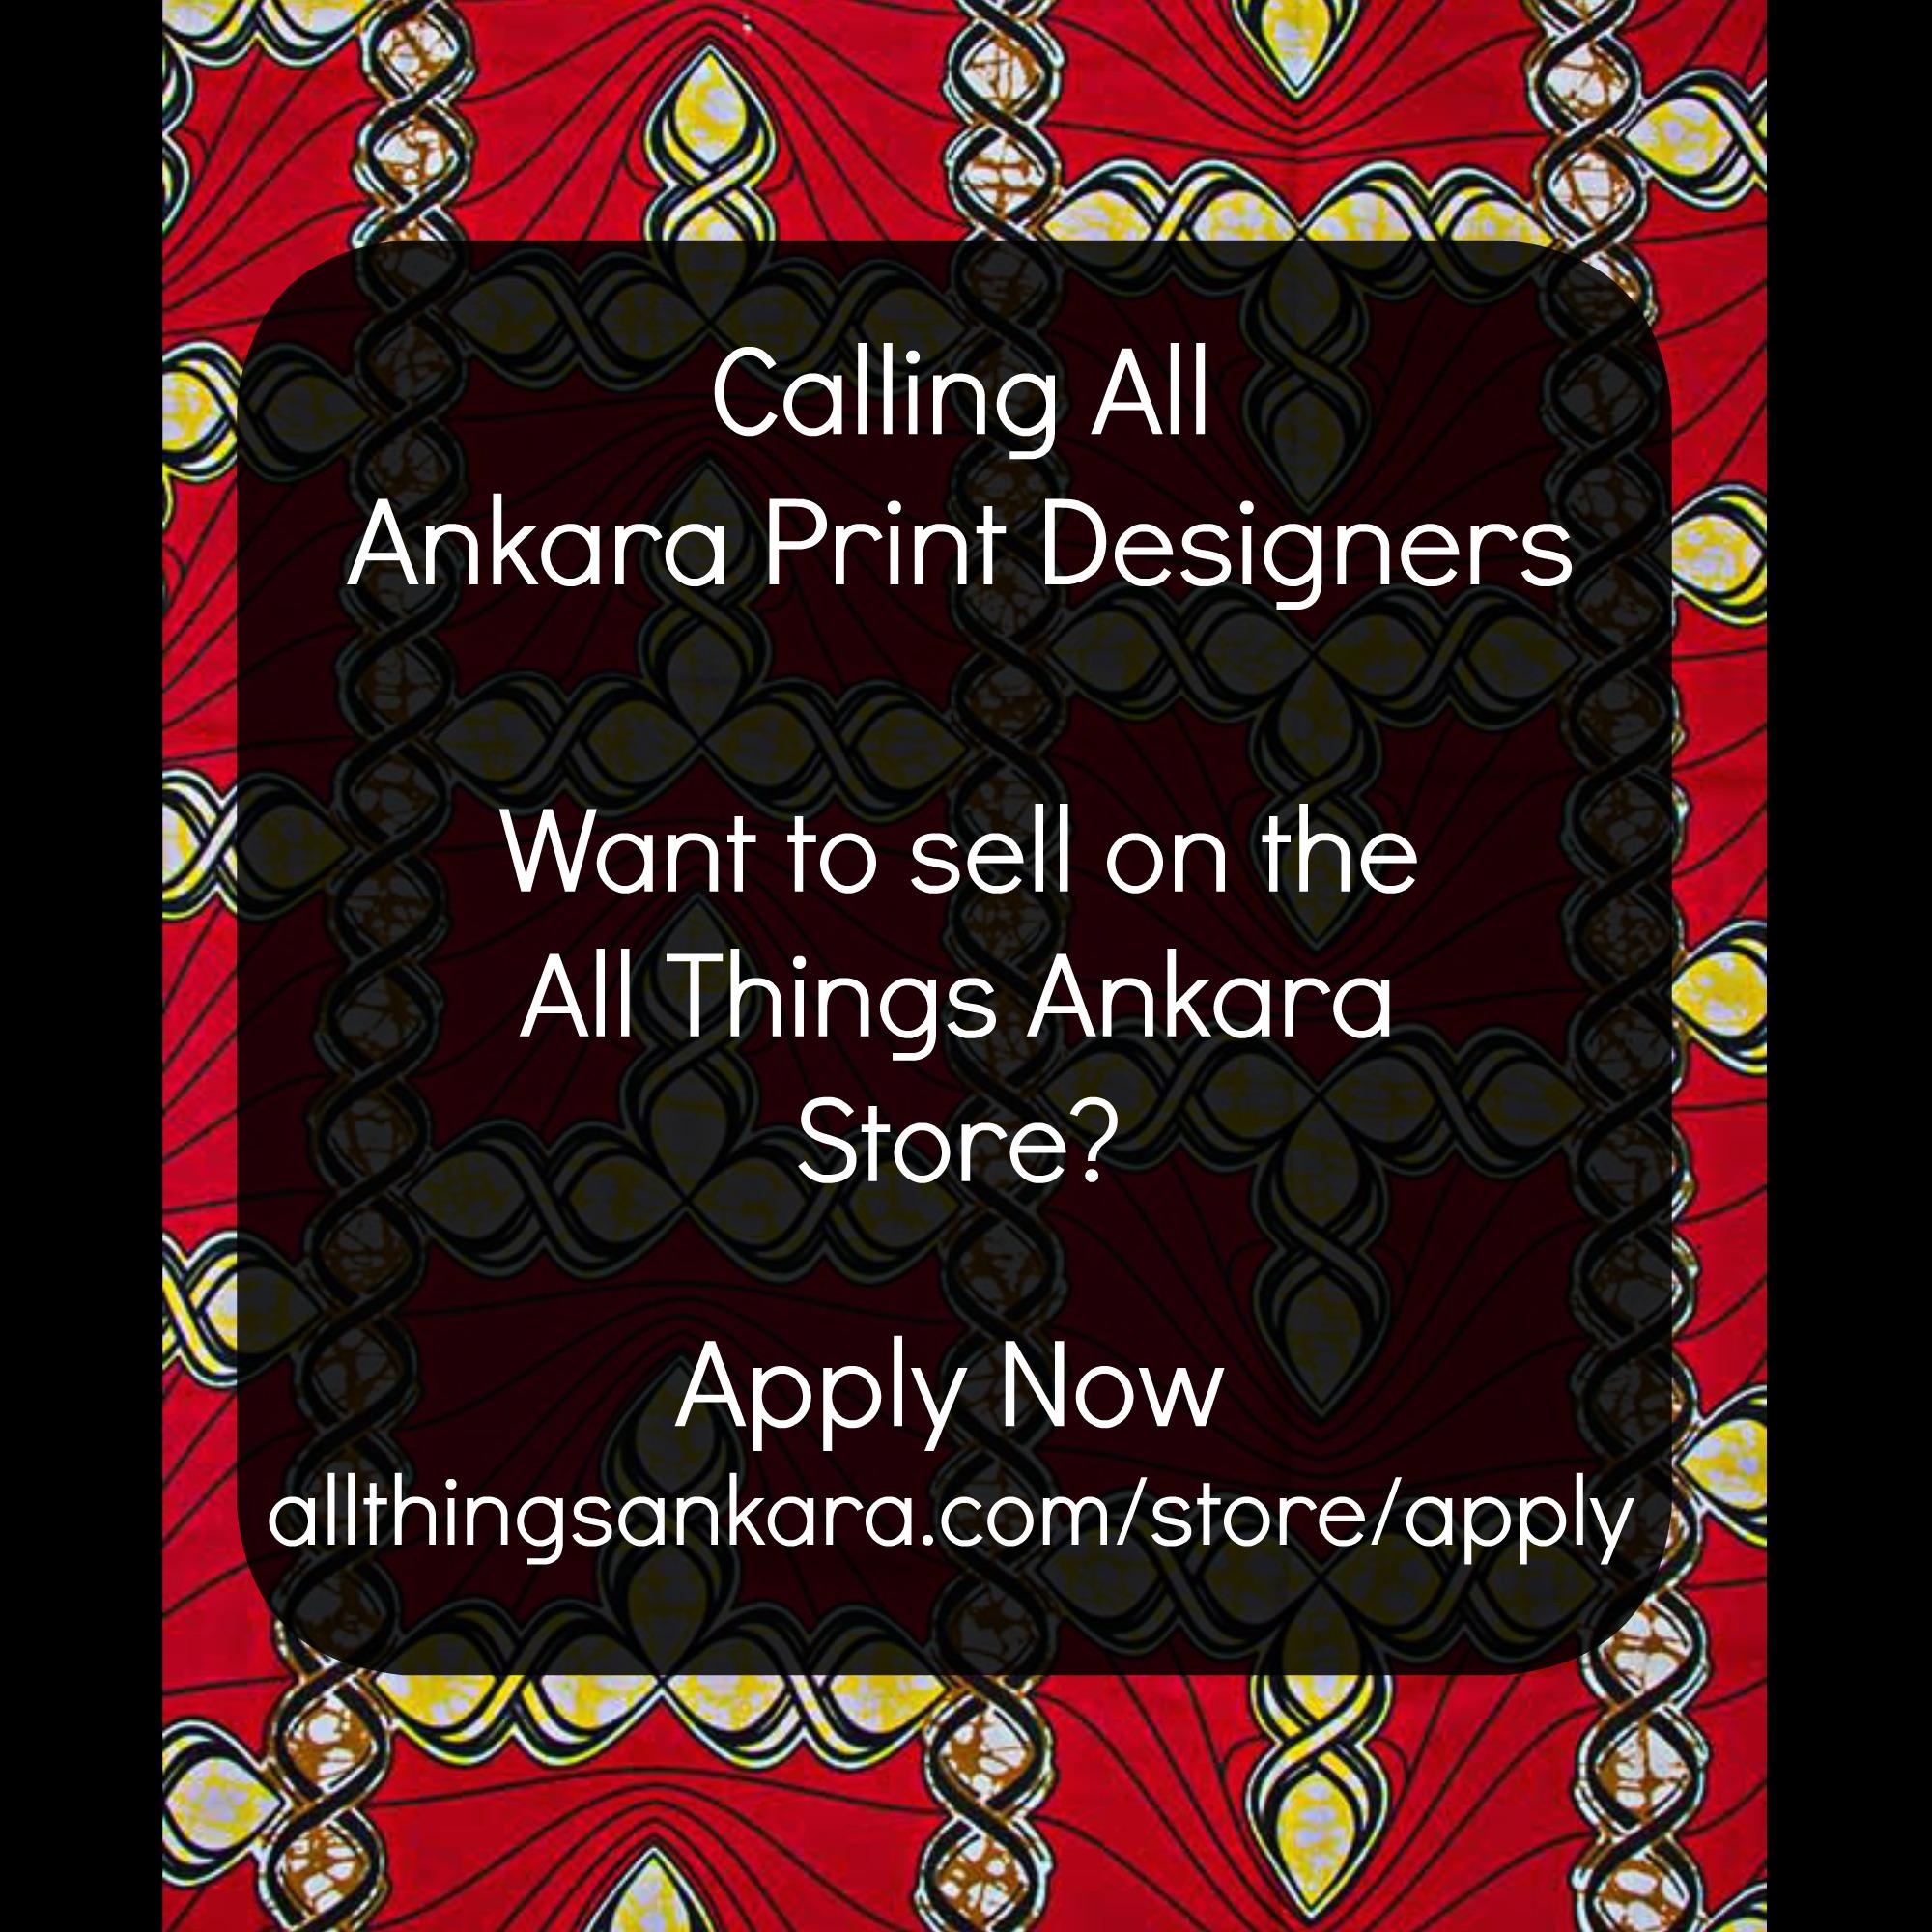 calling-all-ankara-print-designers-to-sell-on-the-all-things-ankara-store